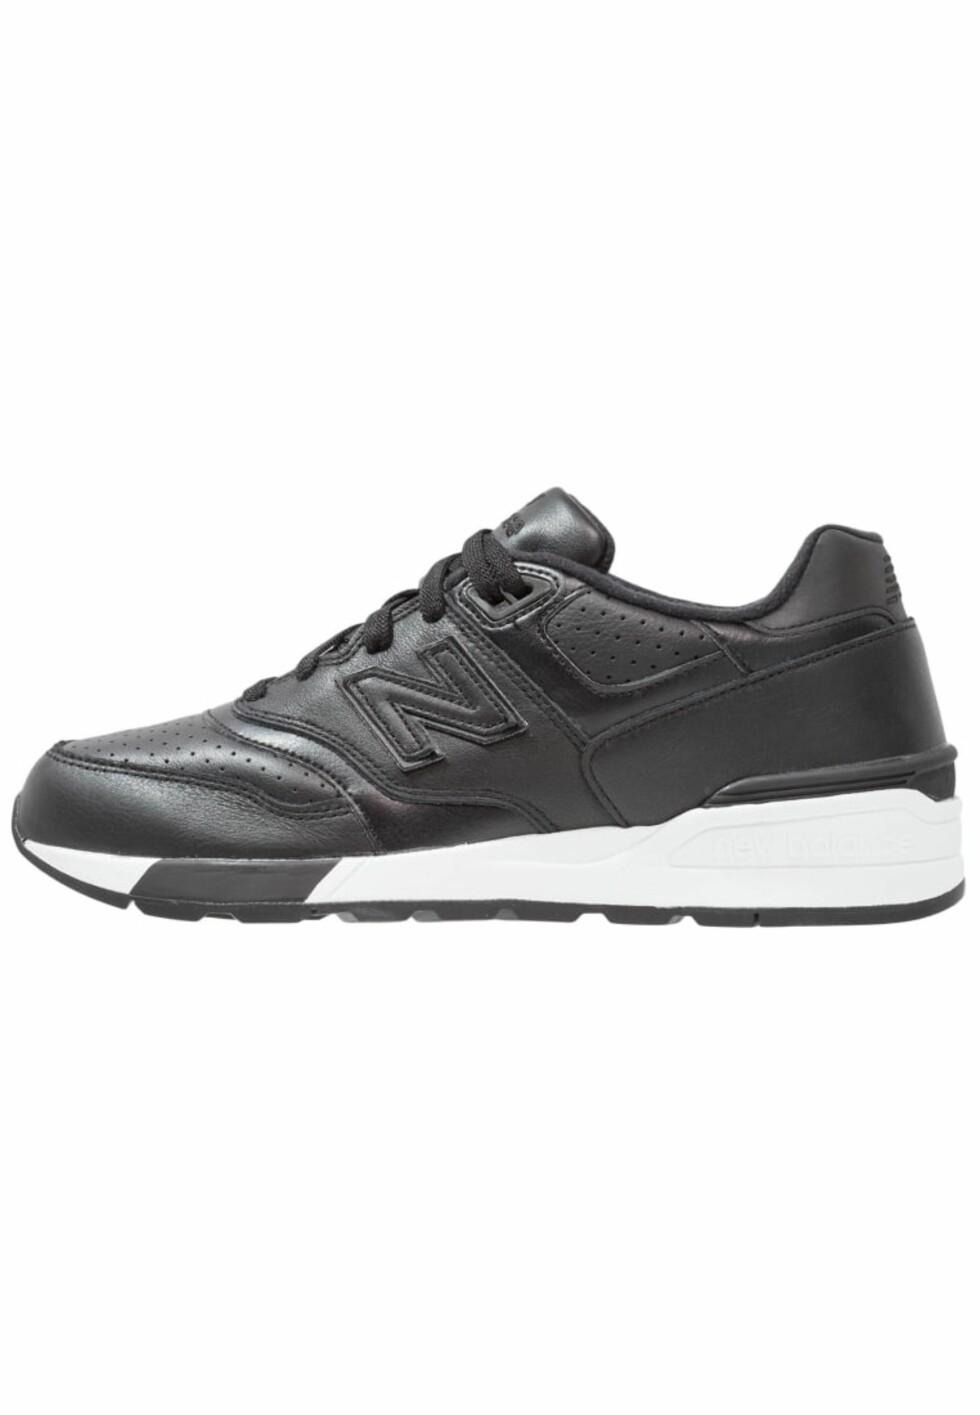 Sneakers fra New Balance via Zalando.no | kr 1095 | http://marketing.net.zalando.no/ts/i4062628/tsc?amc=performance.znd.47259.54735.57747&rmd=3&trg=https%3A%2F%2Fwww.zalando.no%2Fnew-balance-joggesko-black-ne215b03z-q11.html%3Fwmc%3DAFF47_IG_NO.%23%7BPARTNER_ID%7D_%23%7BADSPACE_ID%7D..